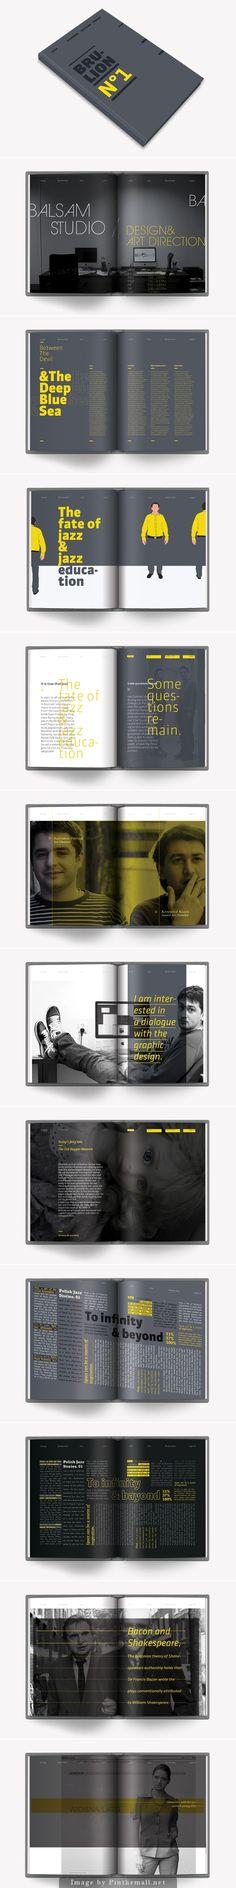 brulionNo.1 - balsamstudio sketchbook may'09 by balsamstudio